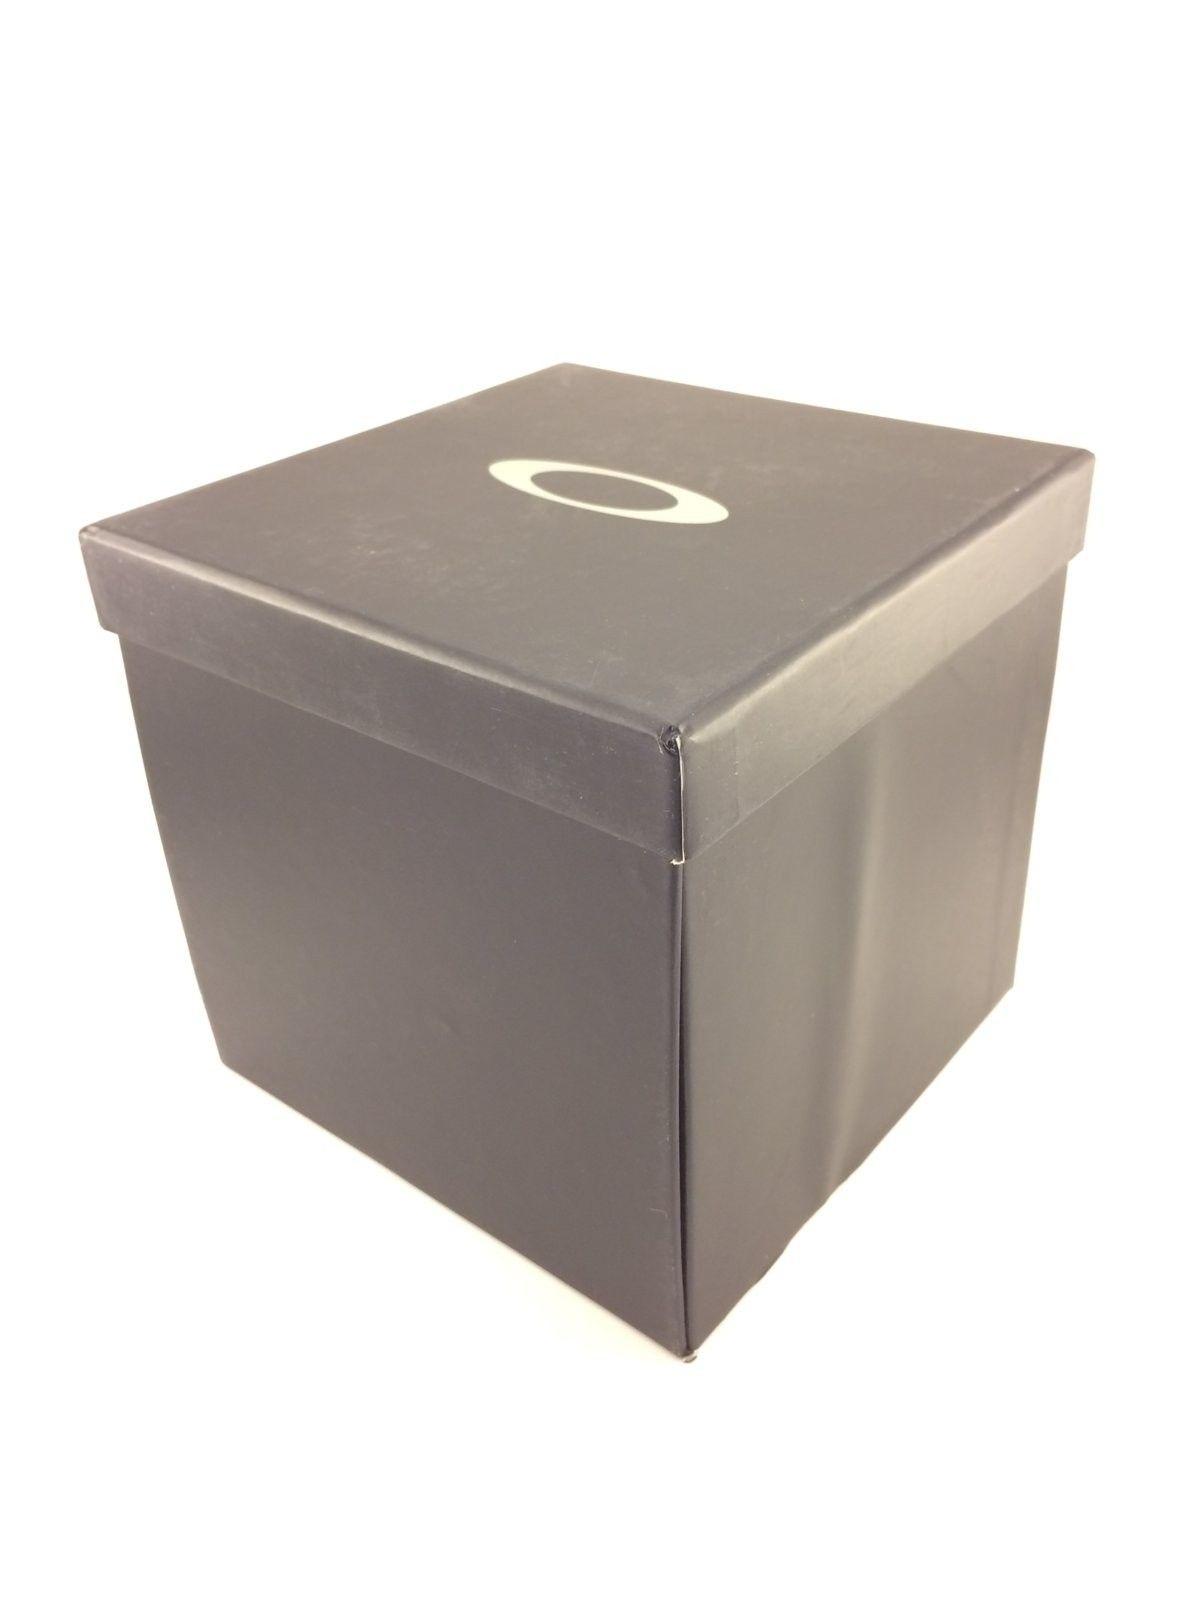 Minute Machine Wooden Box - MM box 695.JPG